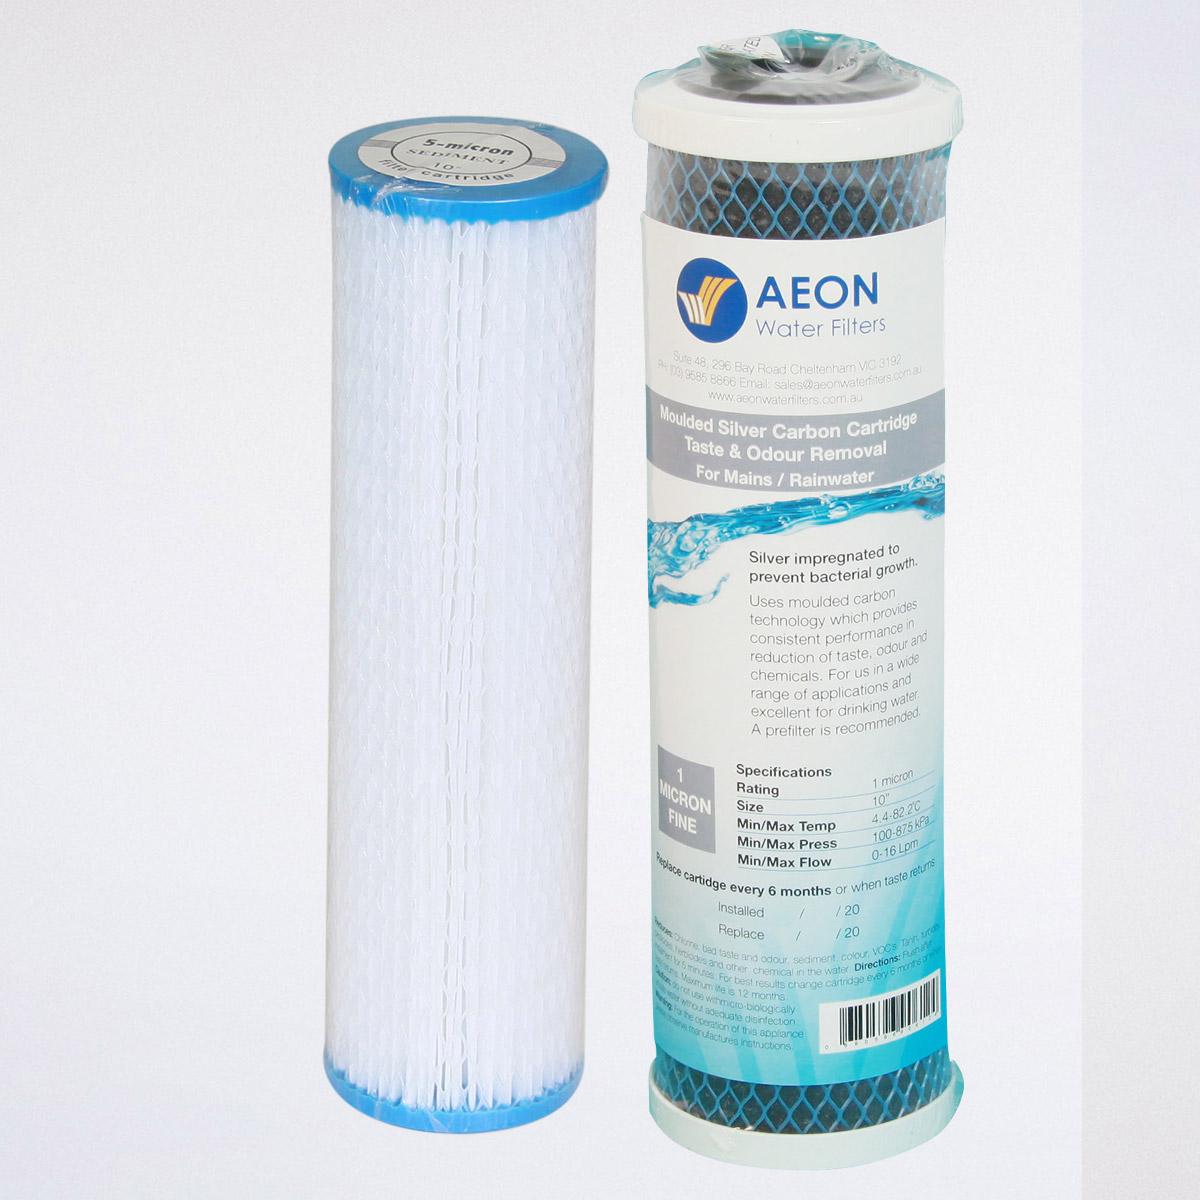 Filter Cartridges - Aeon Water Filters